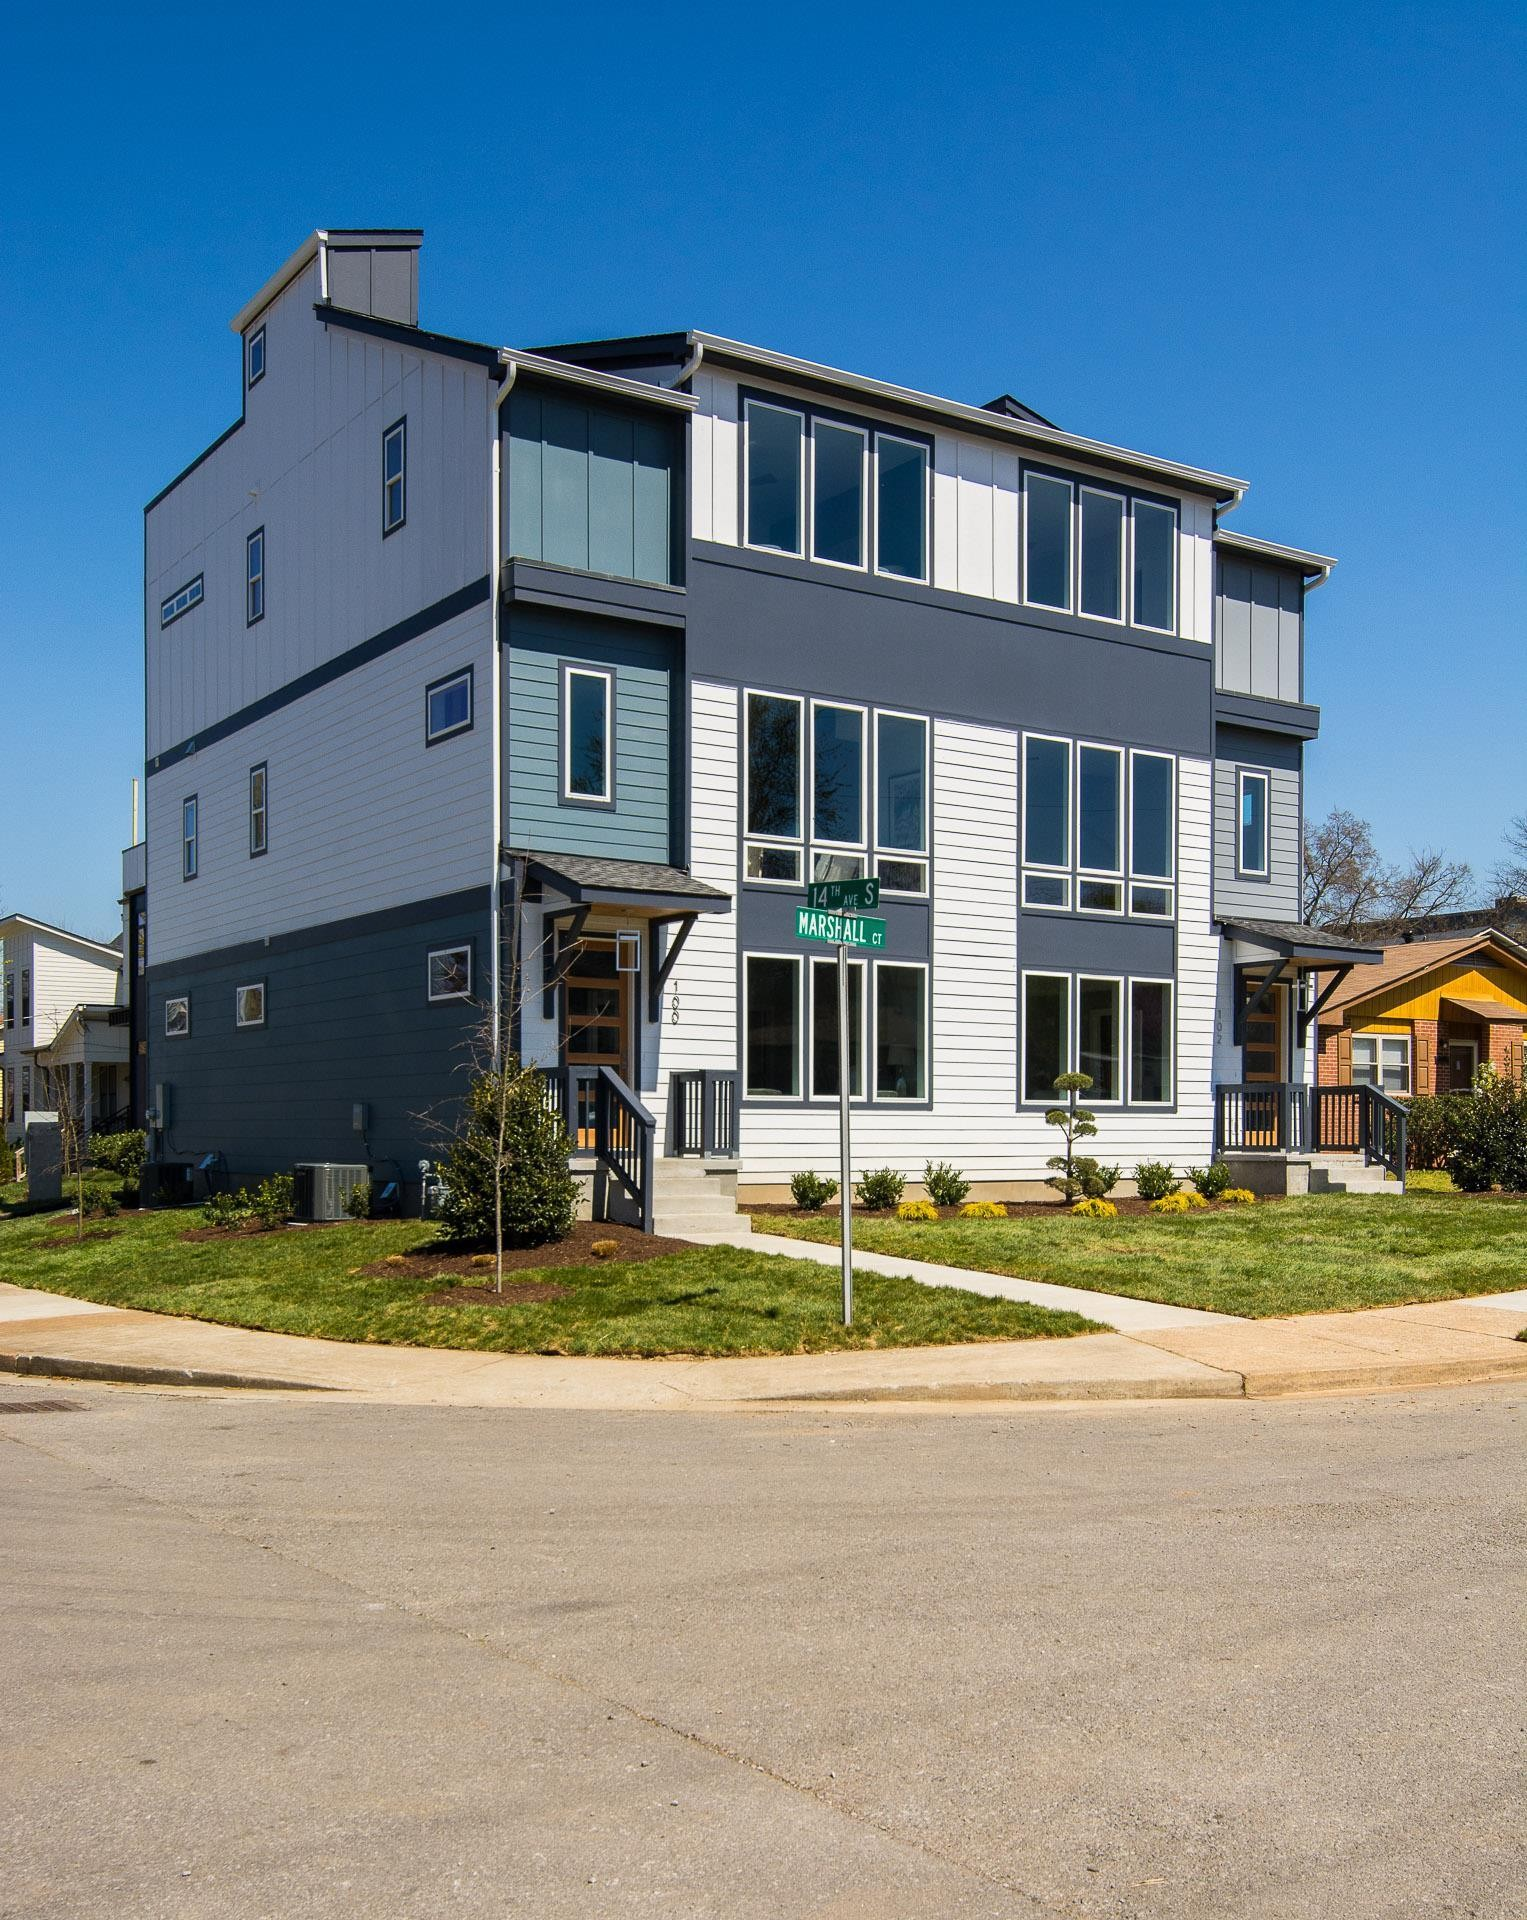 100 Marshall Ct, Nashville, TN 37212 - Nashville, TN real estate listing